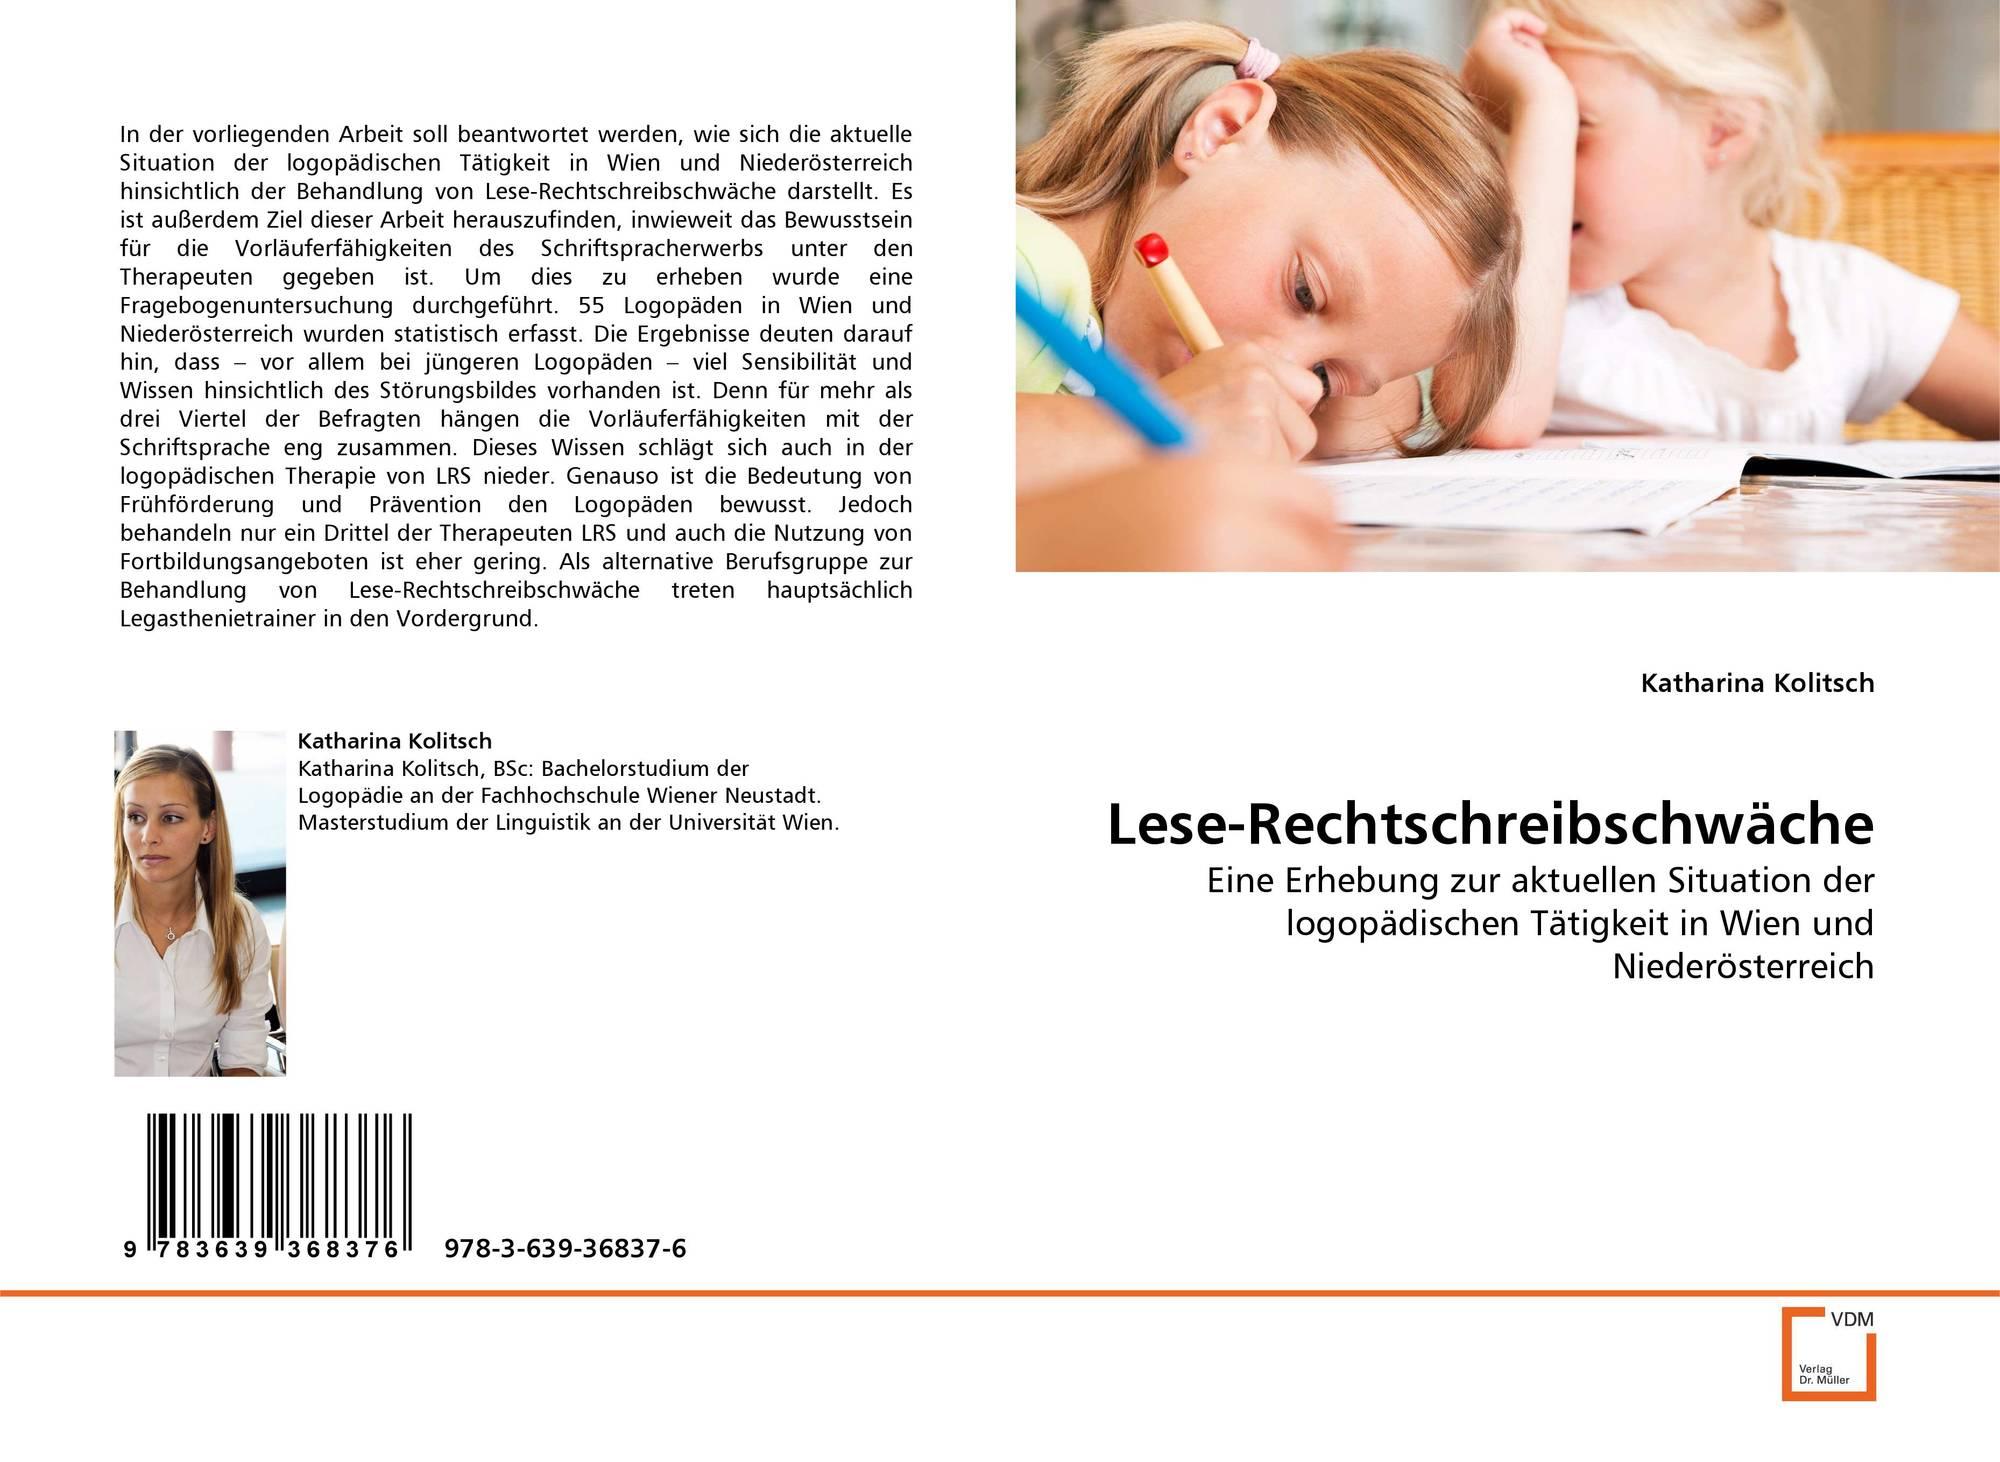 Lese-Rechtschreibschwu00e4che, 978-3-639-36837-6, 3639368371 ,9783639368376 by Katharina Kolitsch